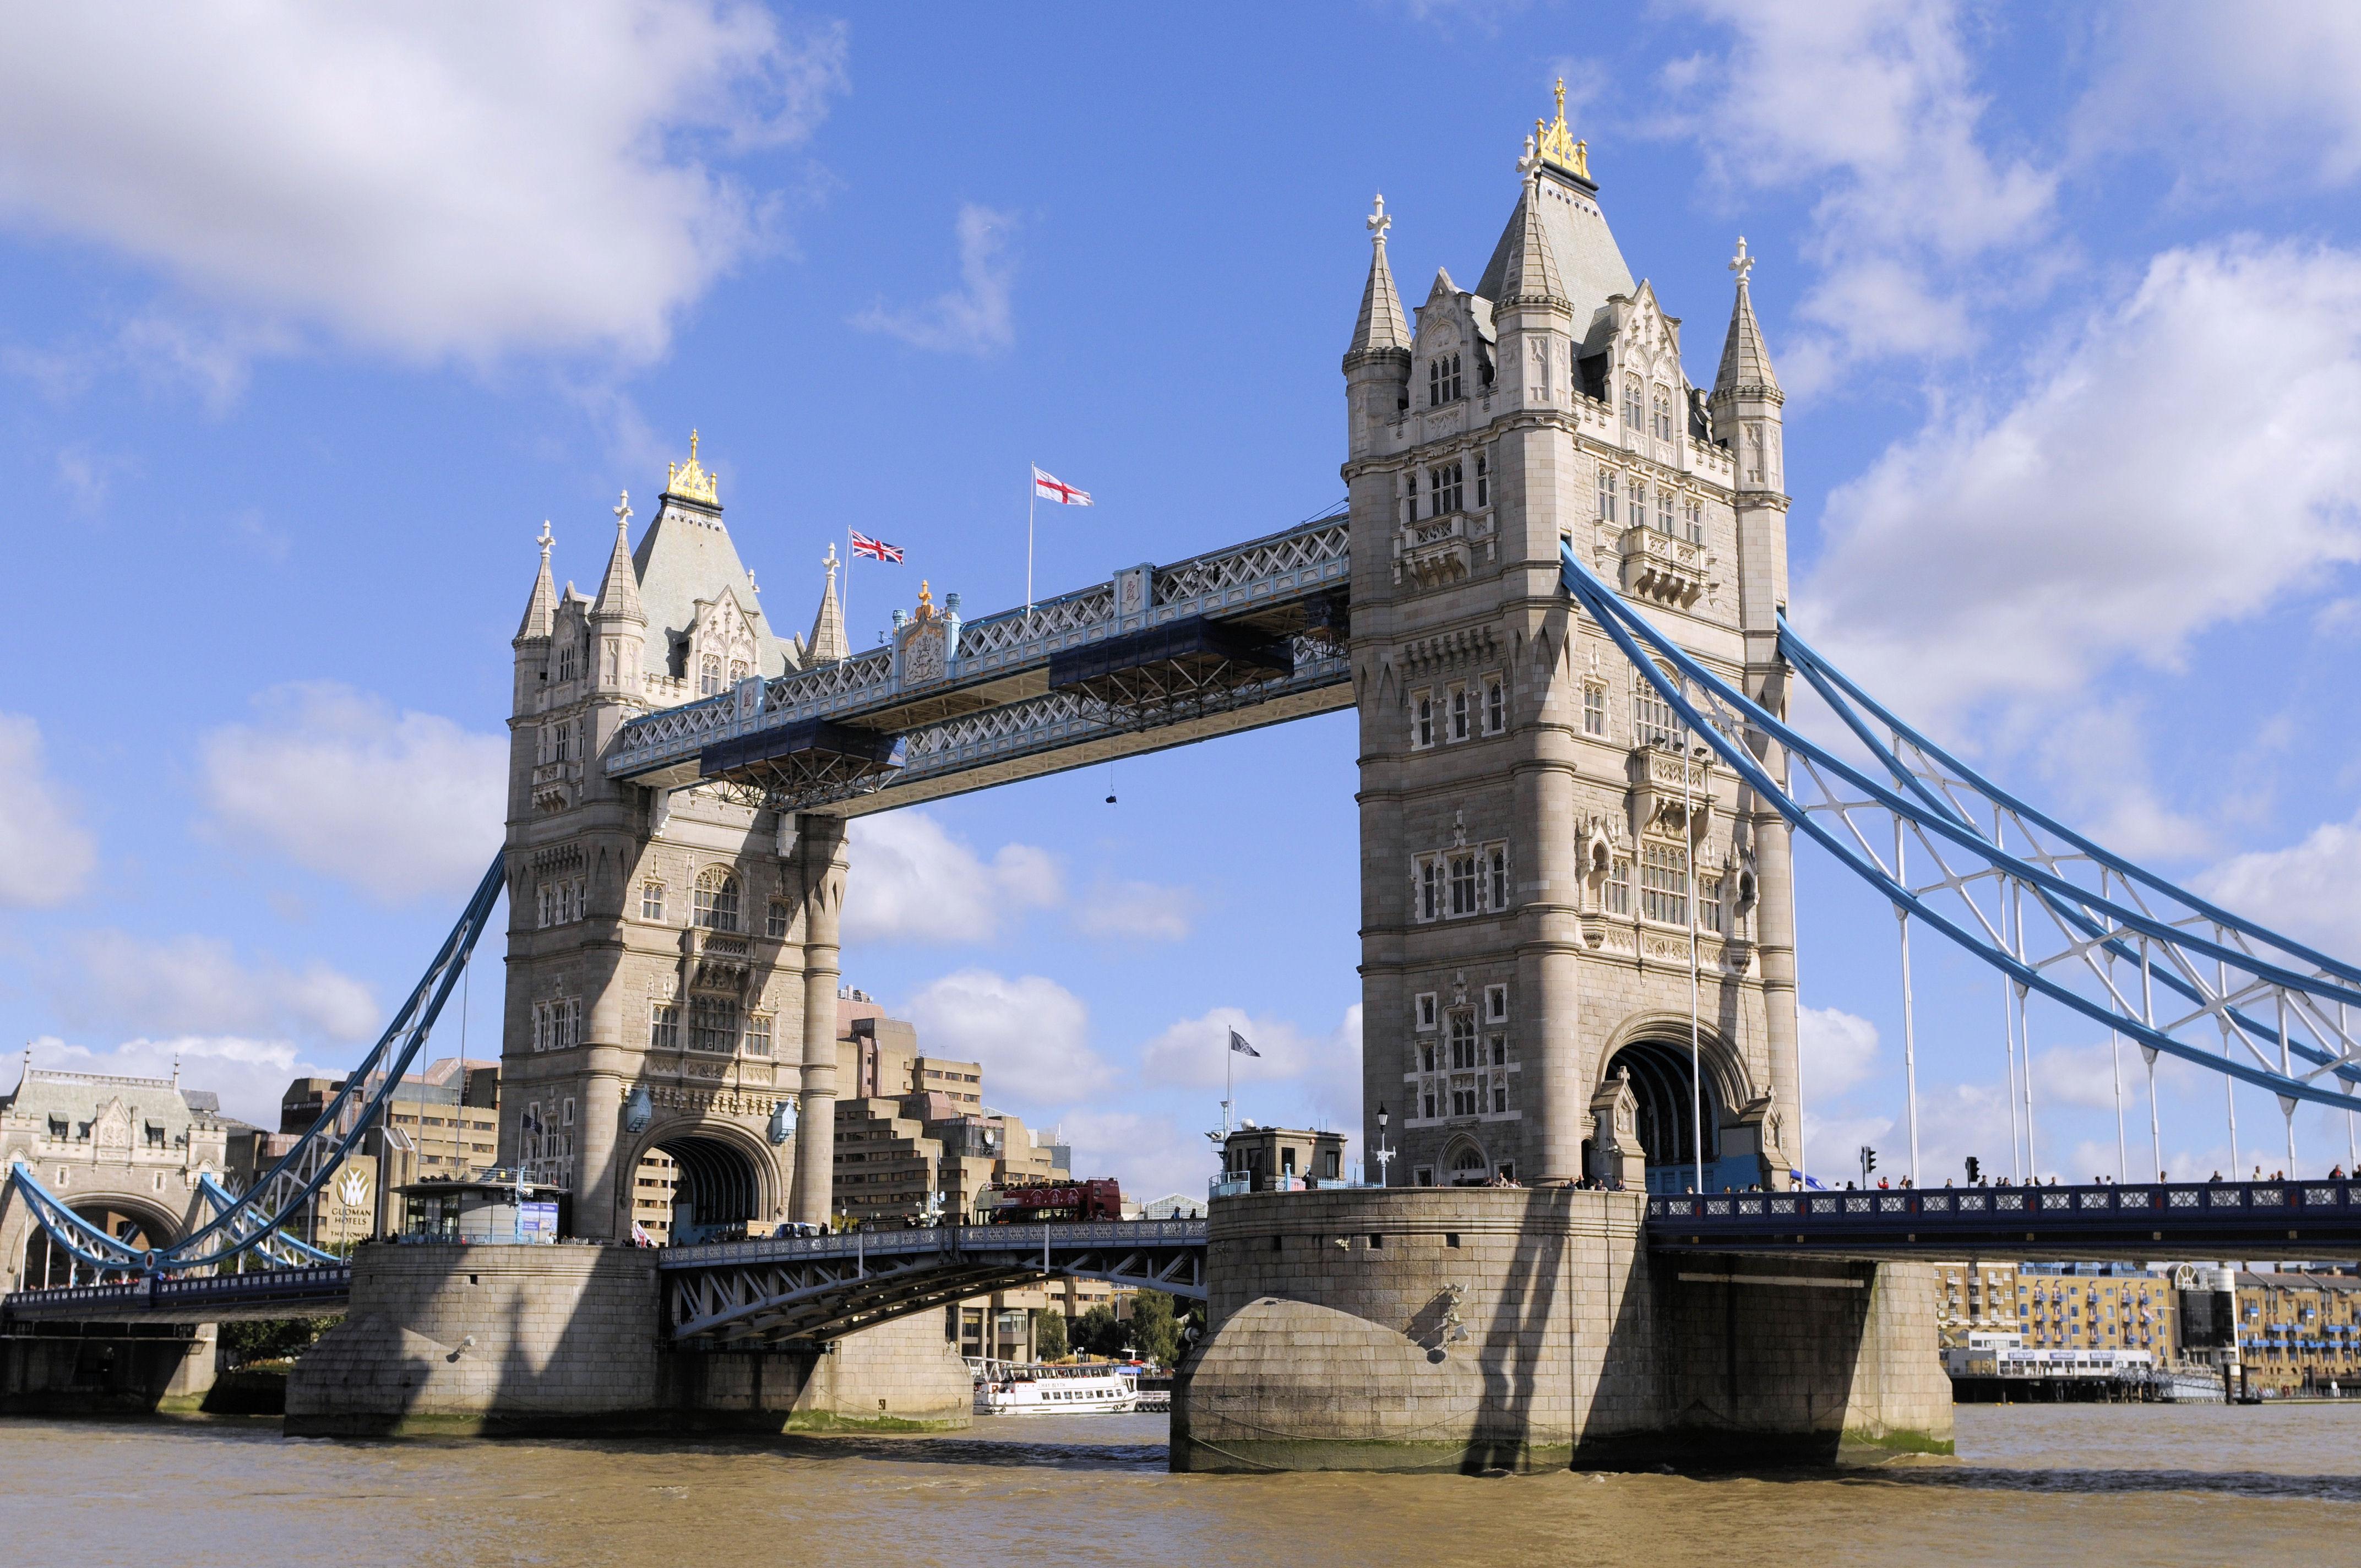 Images of Tower Bridge London England File:tower Bridge London